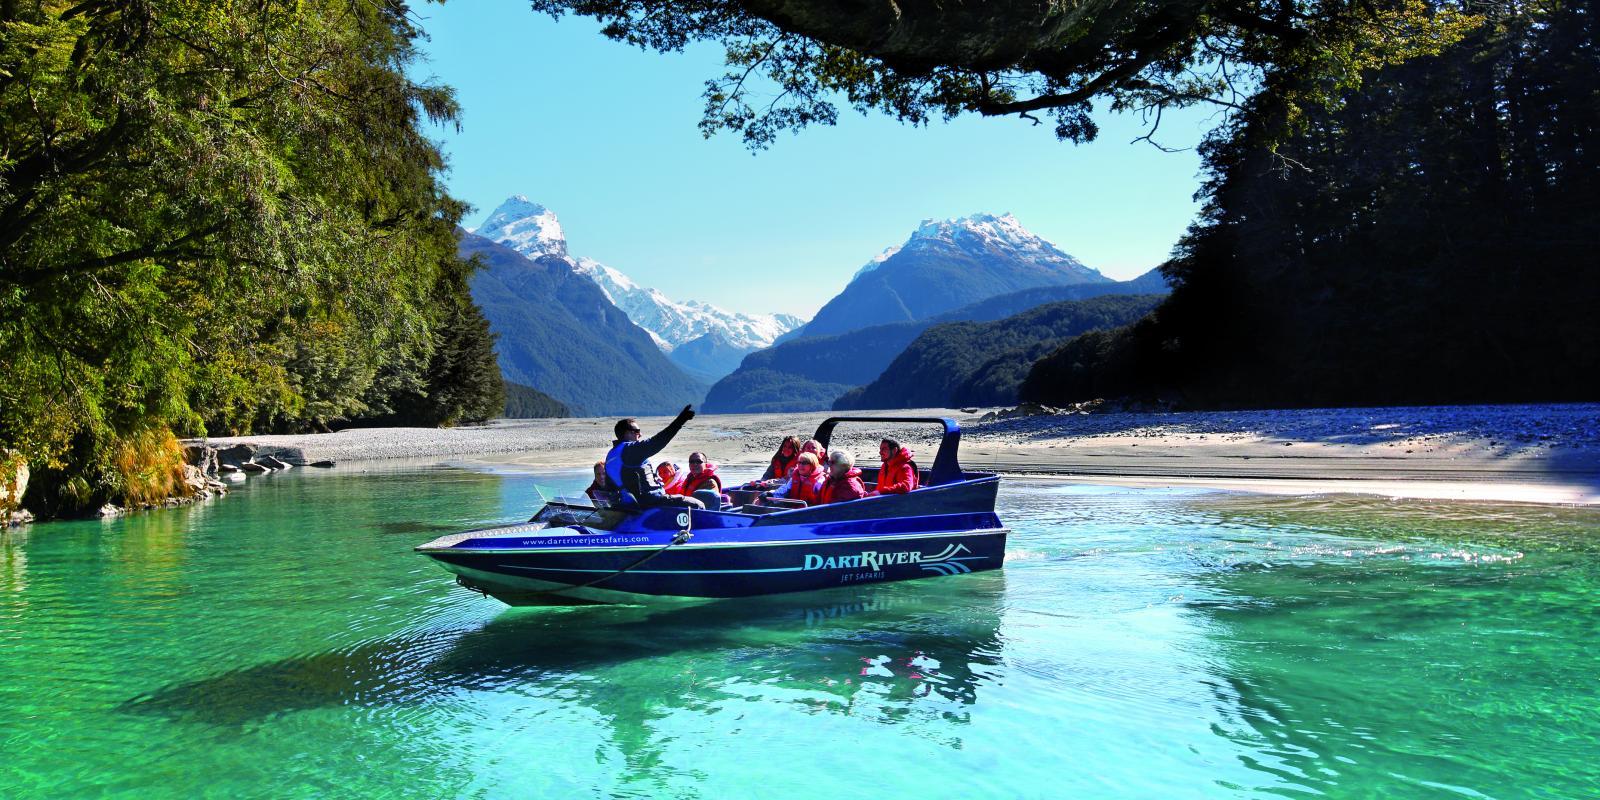 Dart River Jet Boat Wilderness Experience Queenstown